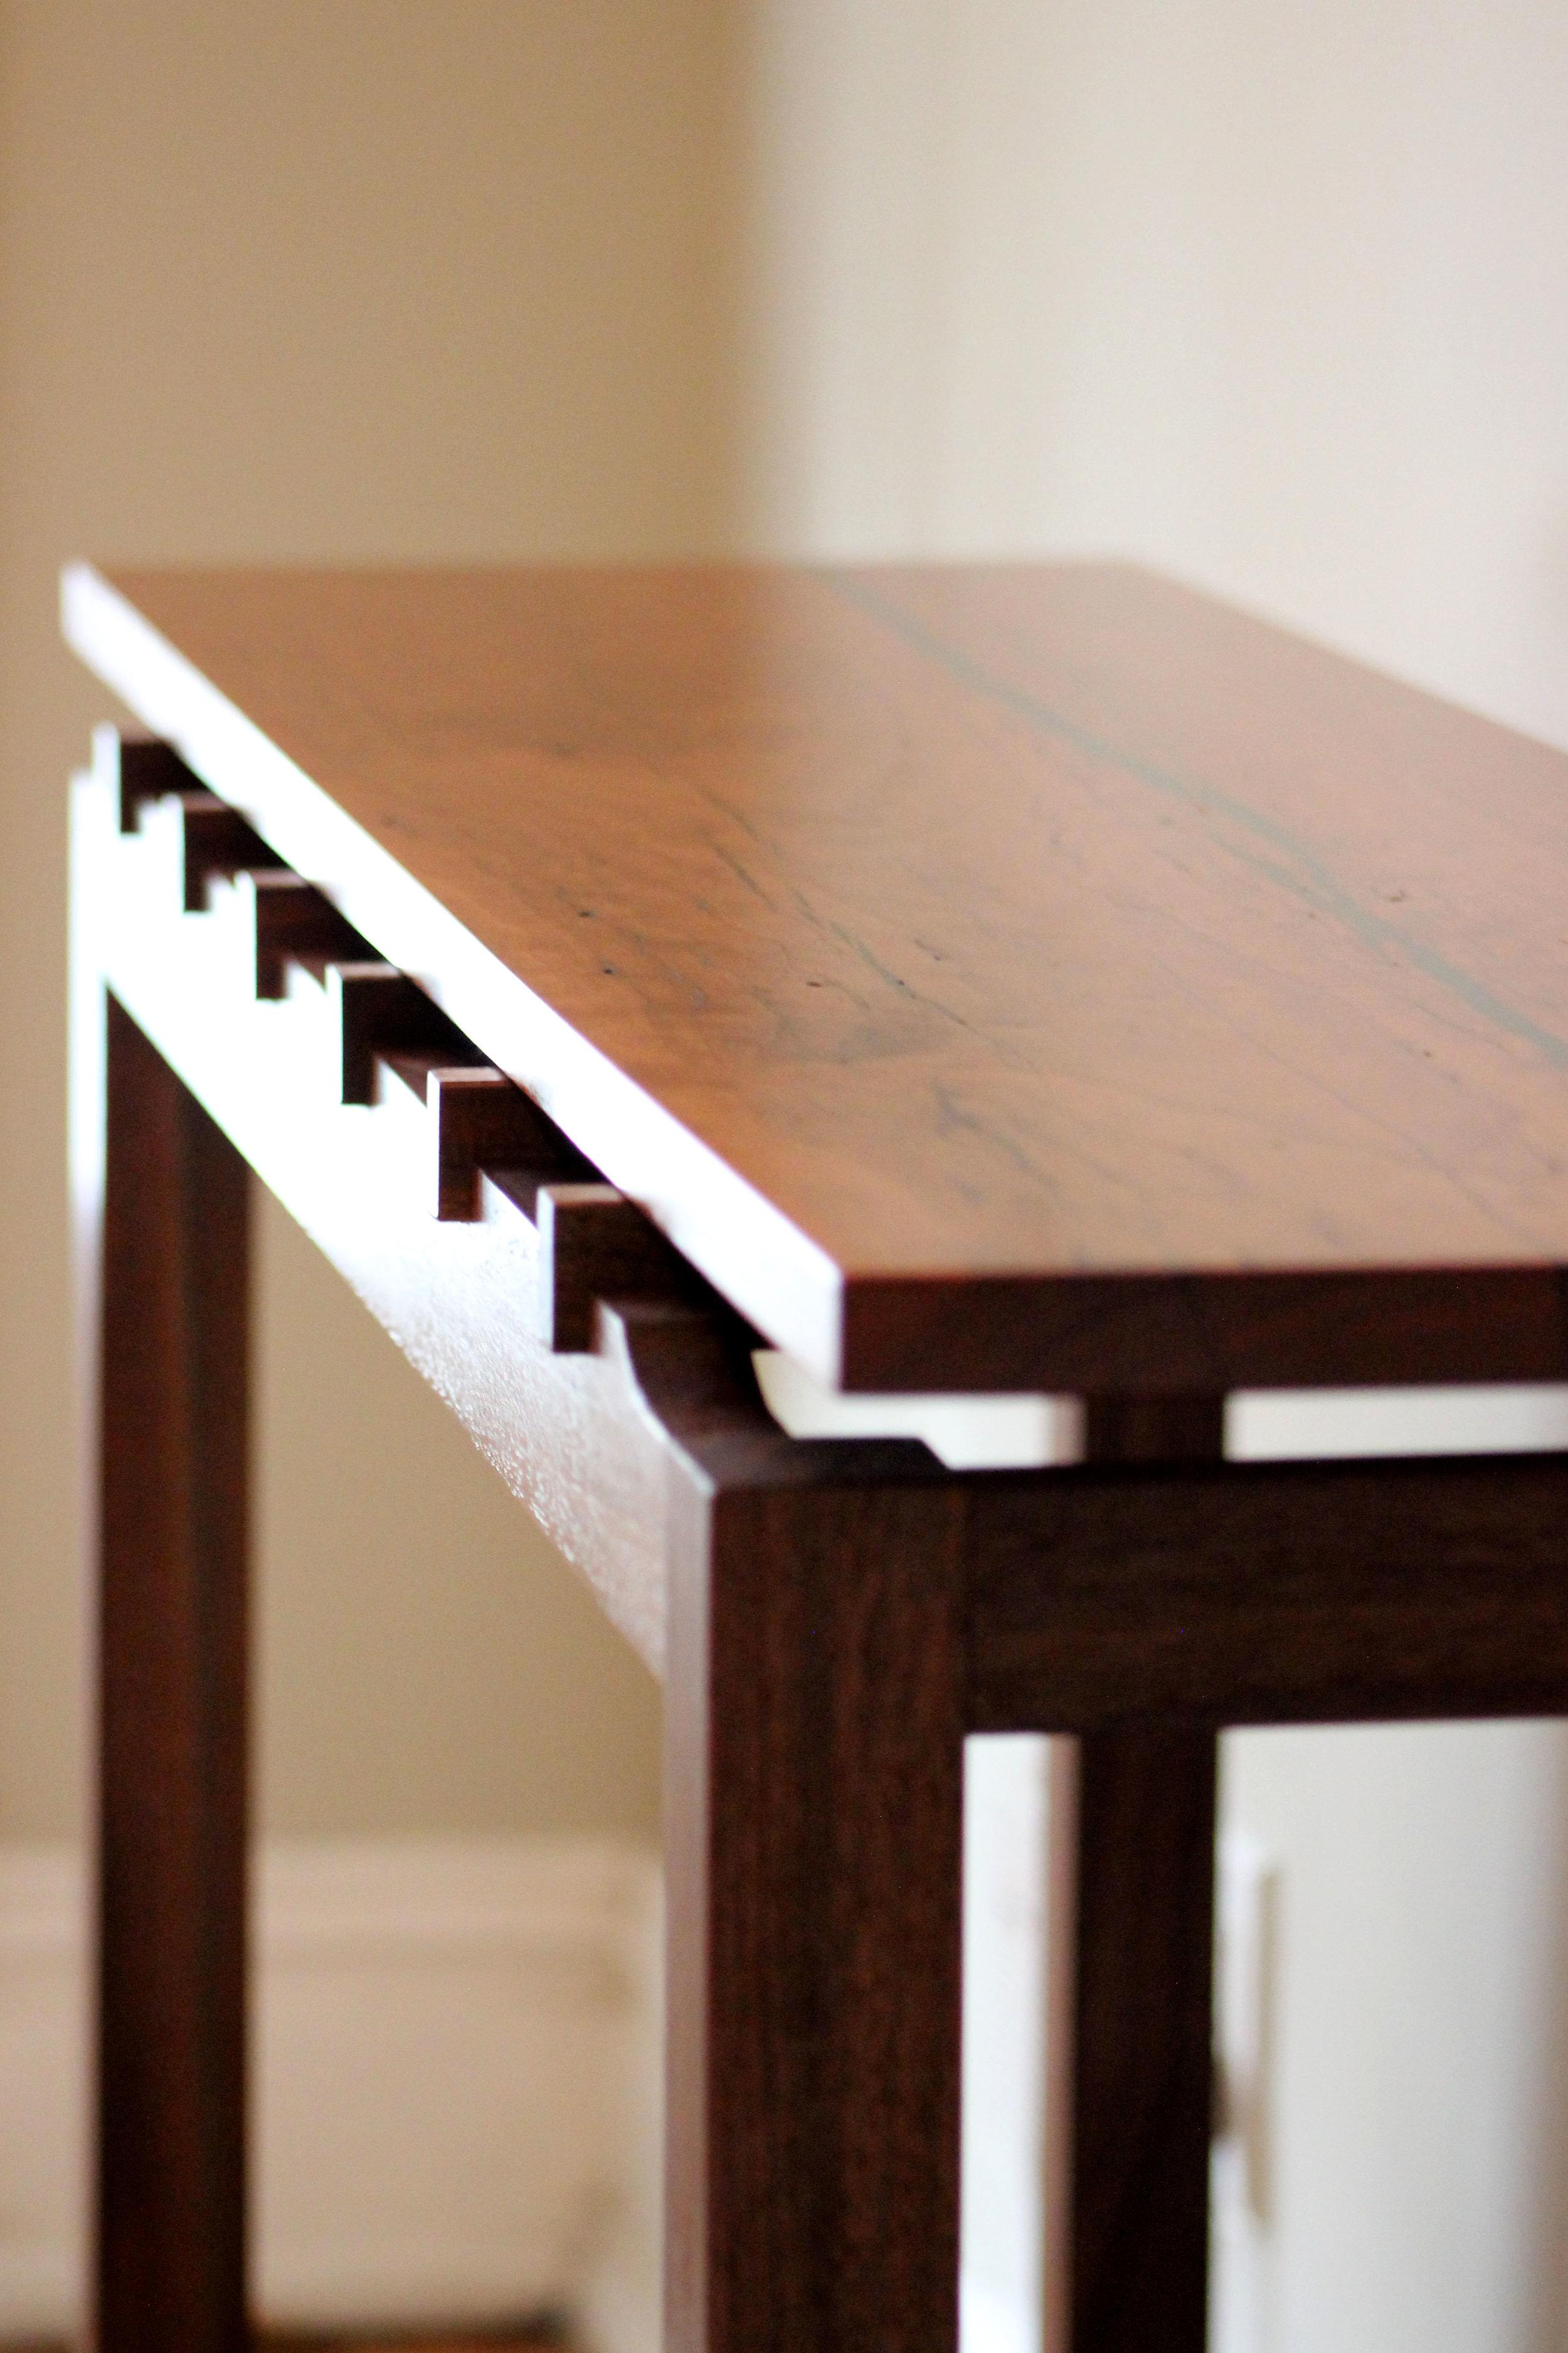 custom cherry and walnut console sofa table with malachite inlay mid century modern furniture Sallie Plumley Studio Richmond Virginia Sally Plumley Custom Woodworking and Furniture Design